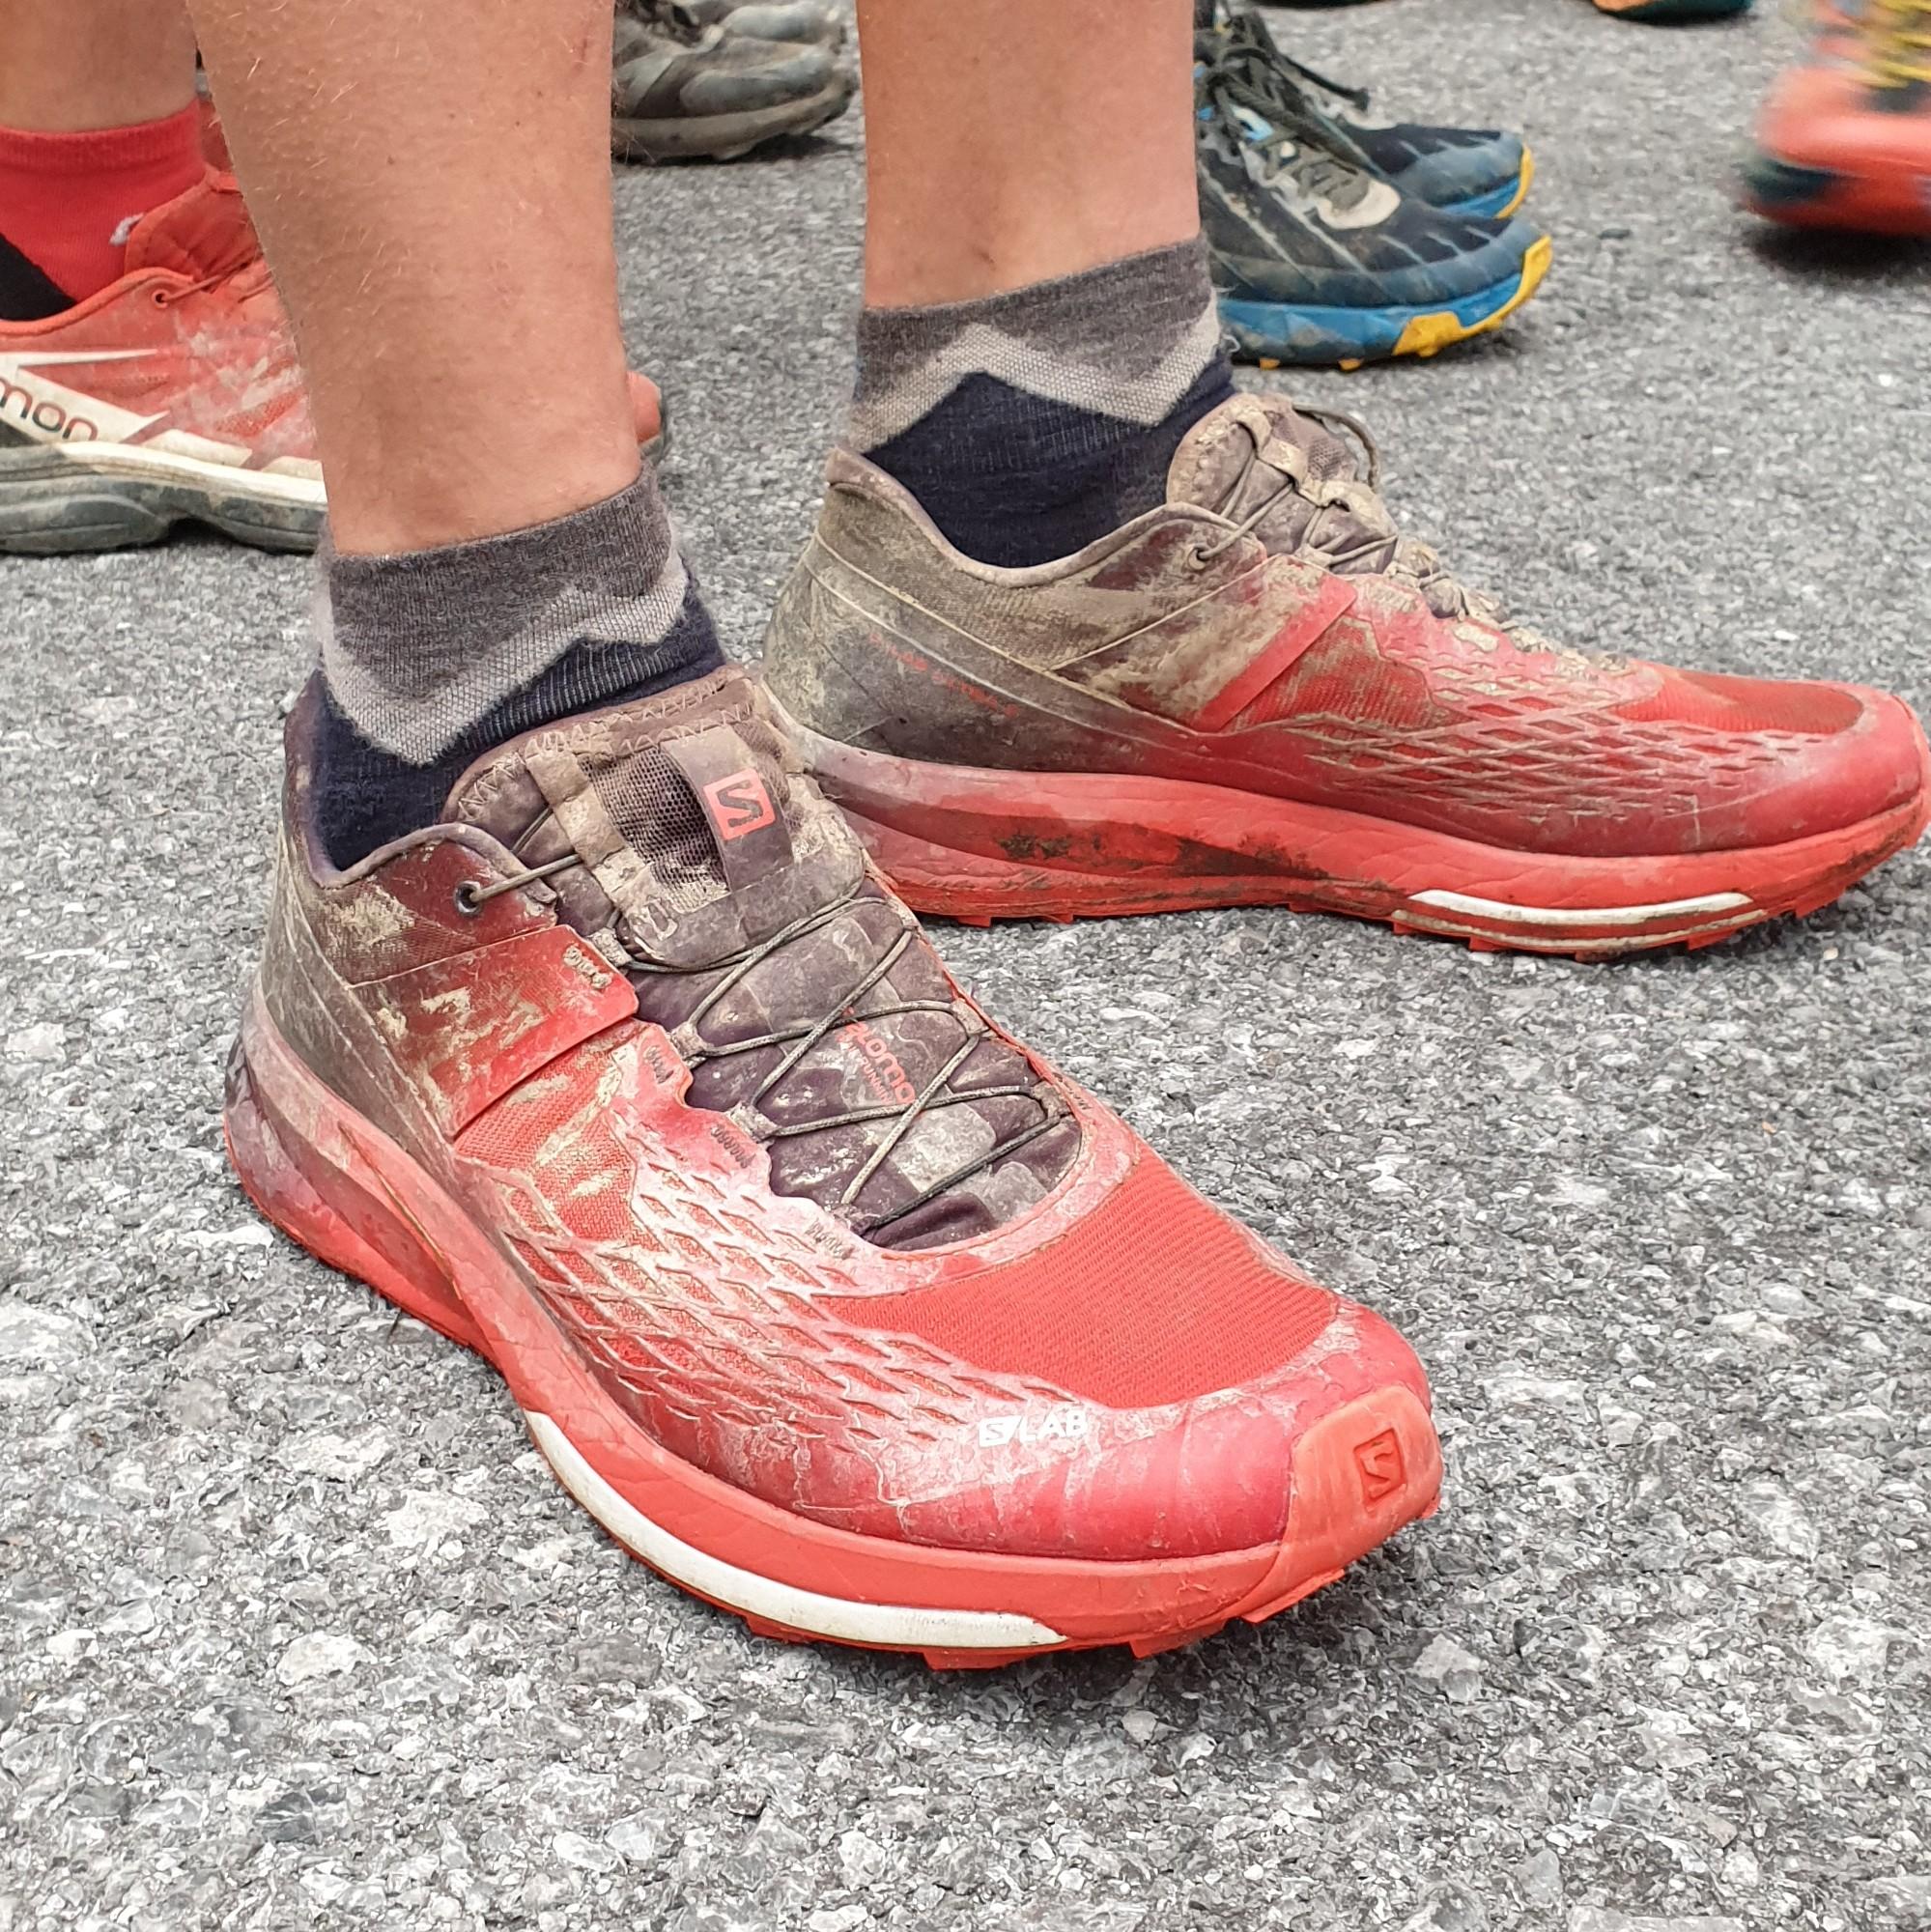 team_runners_lab_transalpine_run_salomon_slab_ultra_2_trail_running